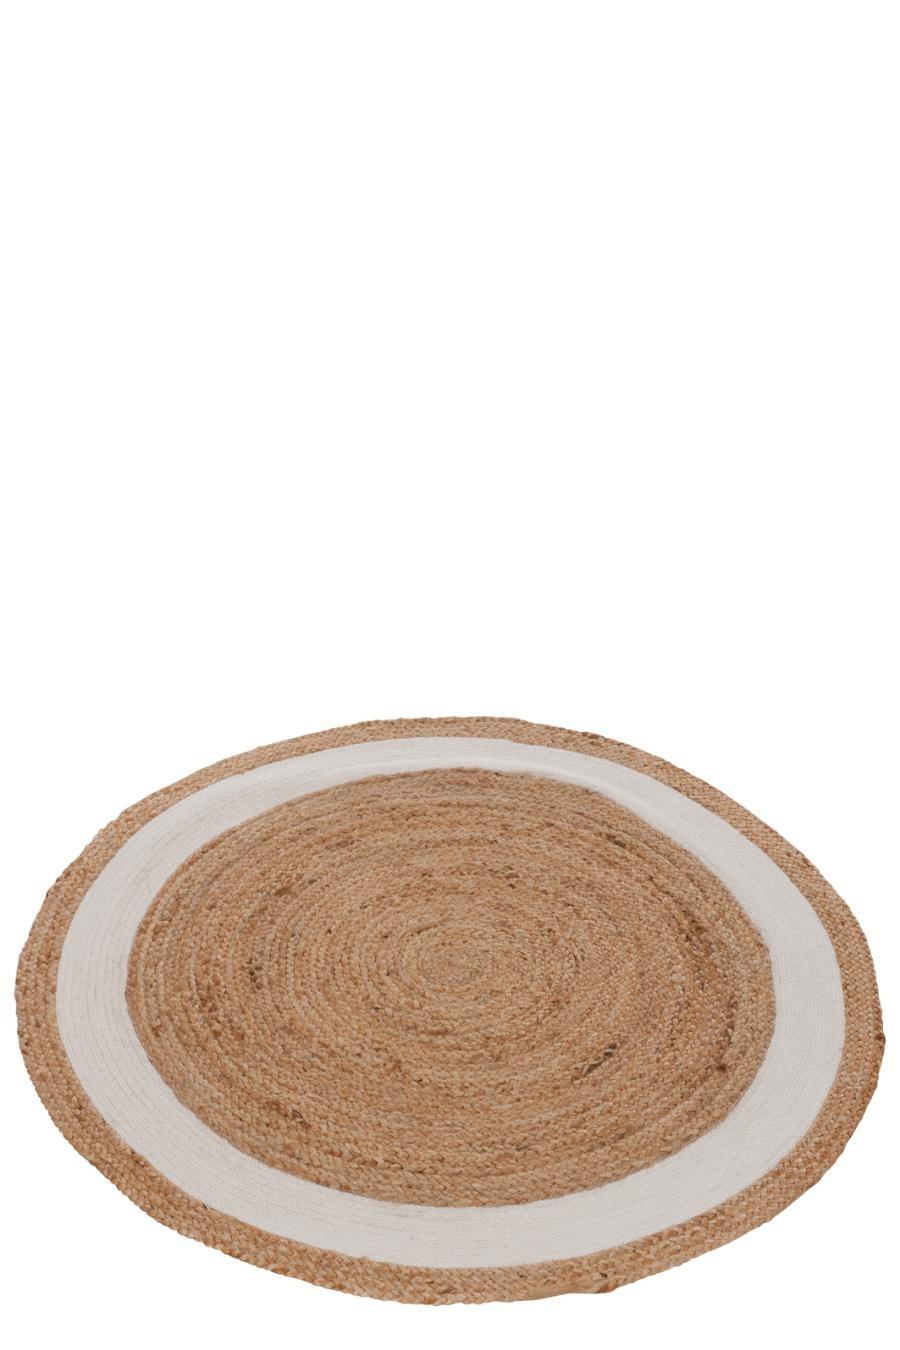 Tapis Rond Jute Coton Naturel Blanc 120x120x0cm J Line By Jolip